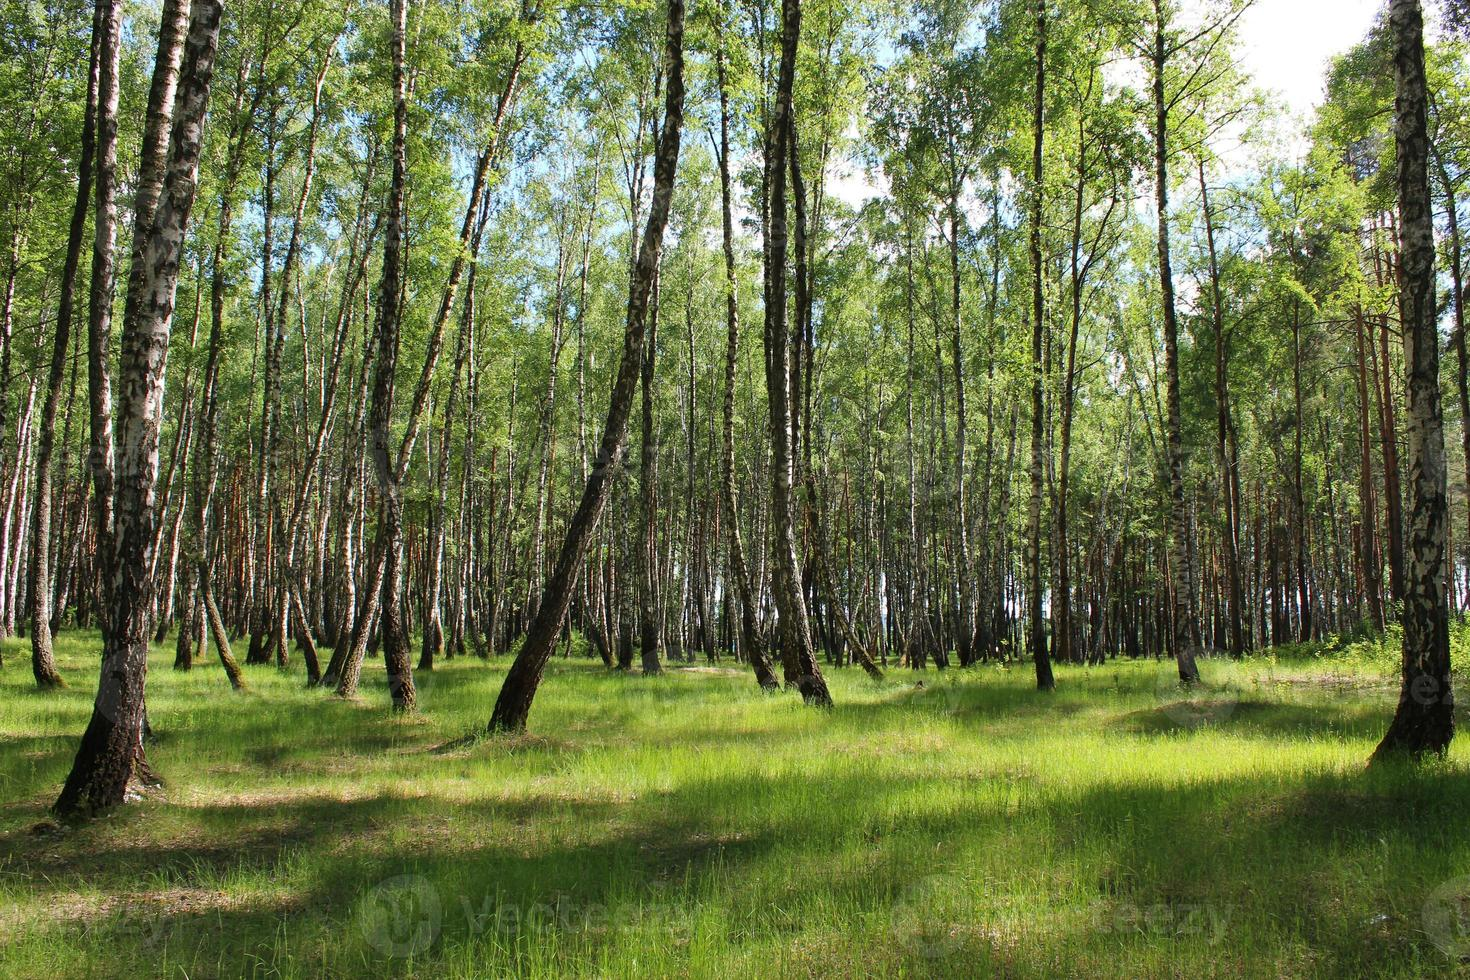 birchwood in the spring photo